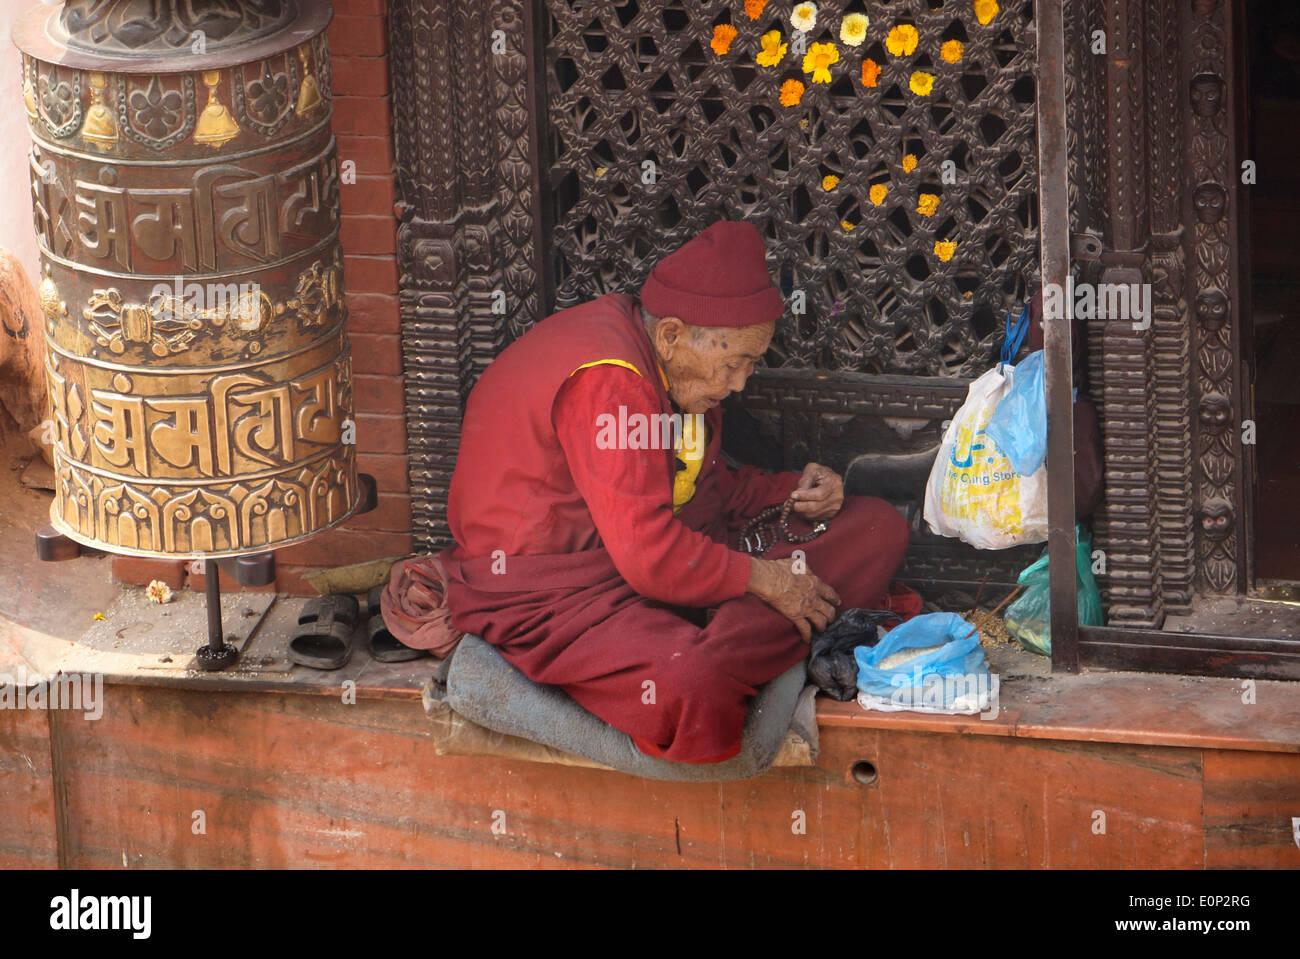 Believing Spirits Monk Buddhism Religion Buddha Meditation